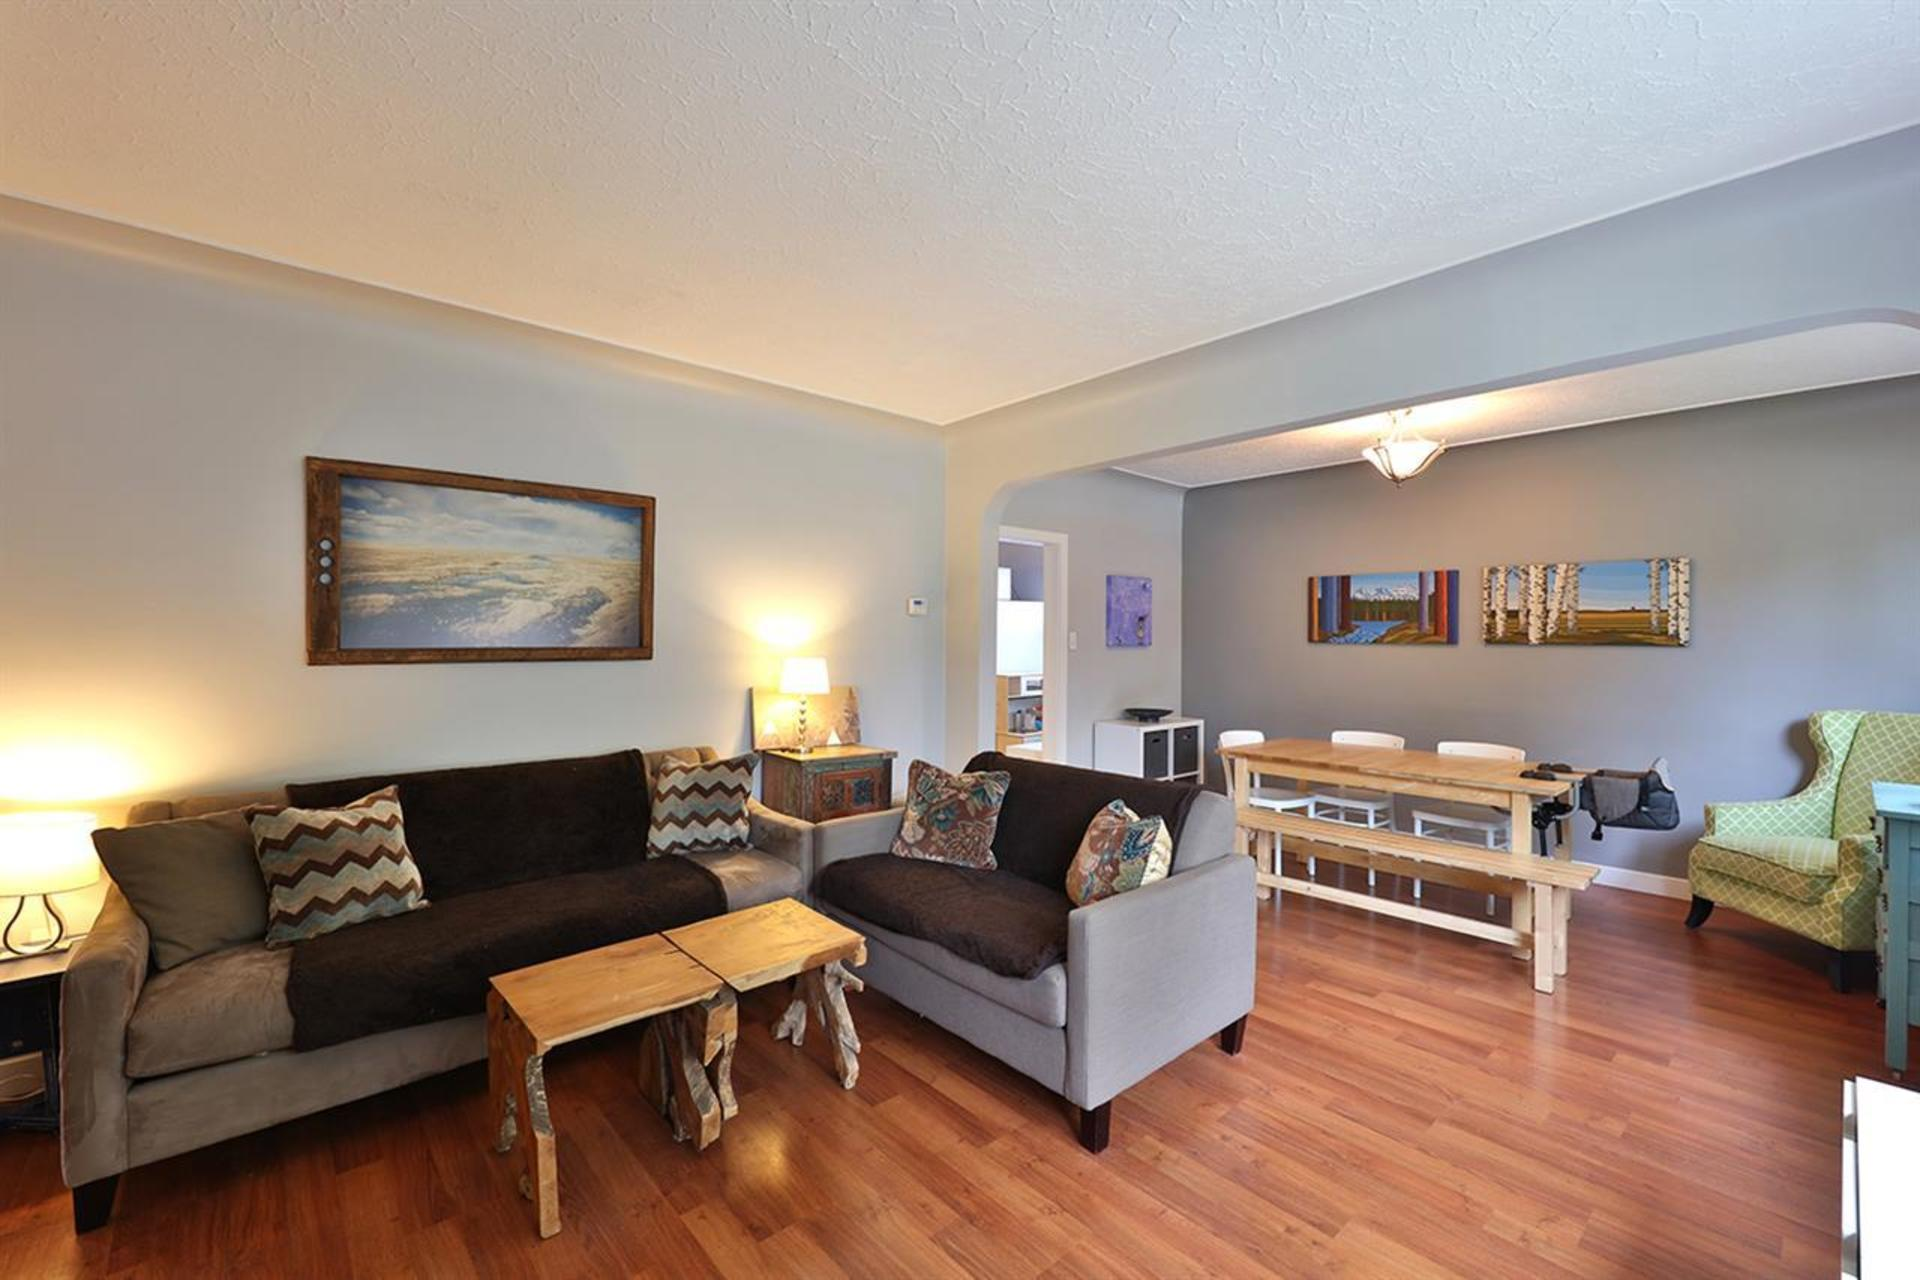 8819-87-street-bonnie-doon-edmonton-02 at 8819 87 Street, Bonnie Doon, Edmonton